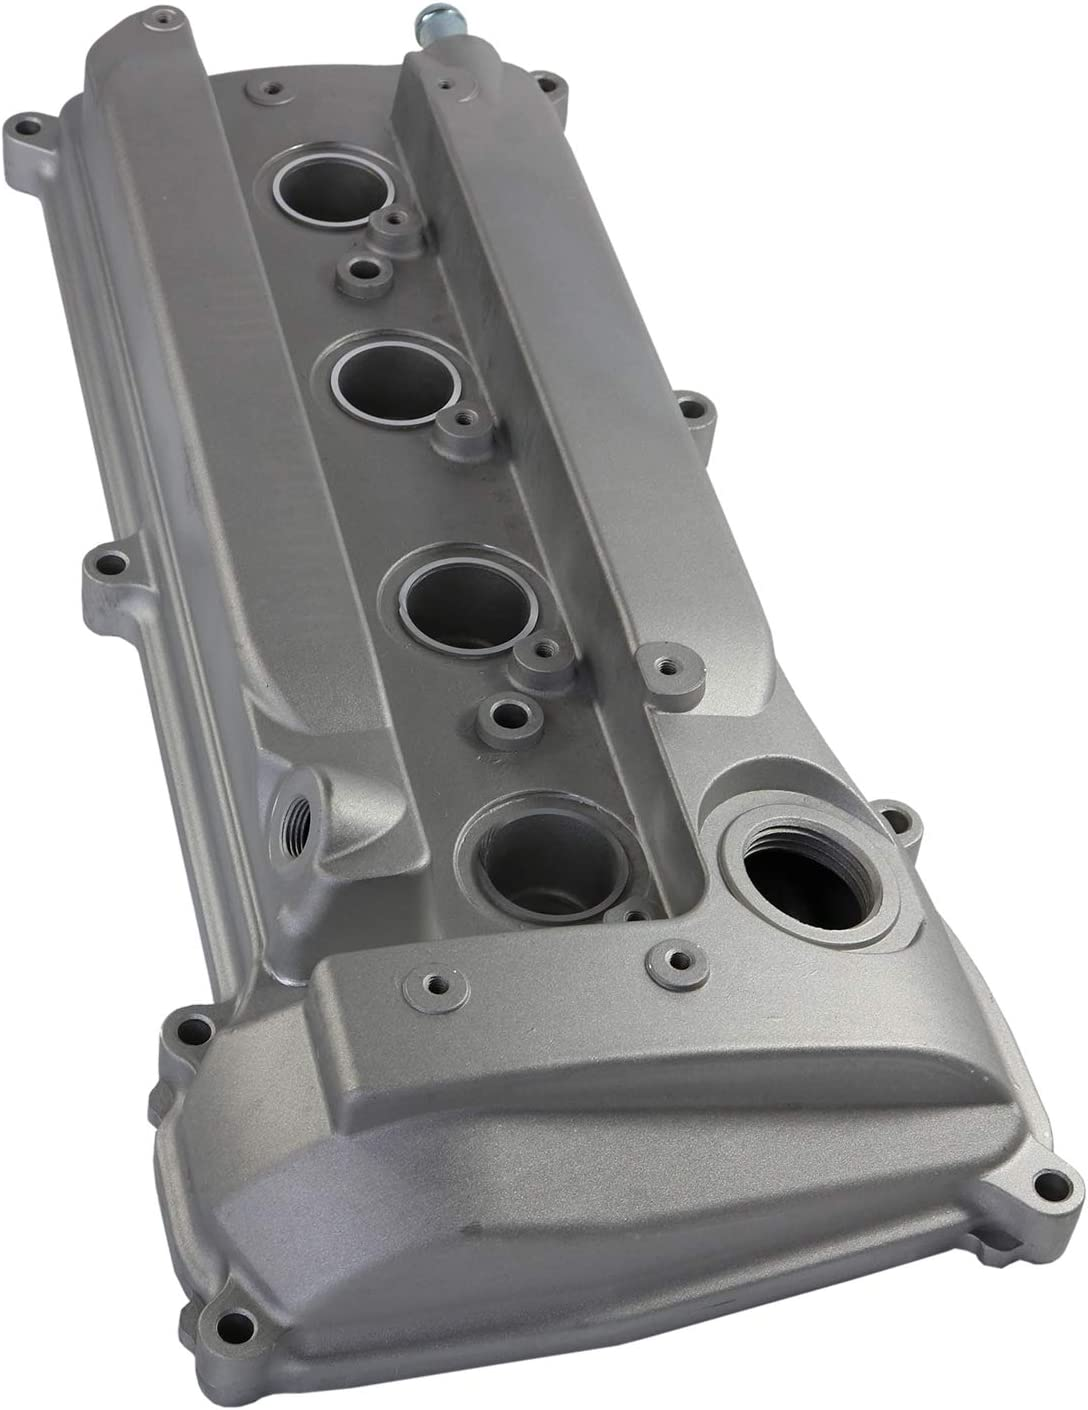 JDMSPEED New Engine Valve Cover 11201-28033 11201-28014 For Toyota RAV4 Camry Tarago 1AZ 2AZ